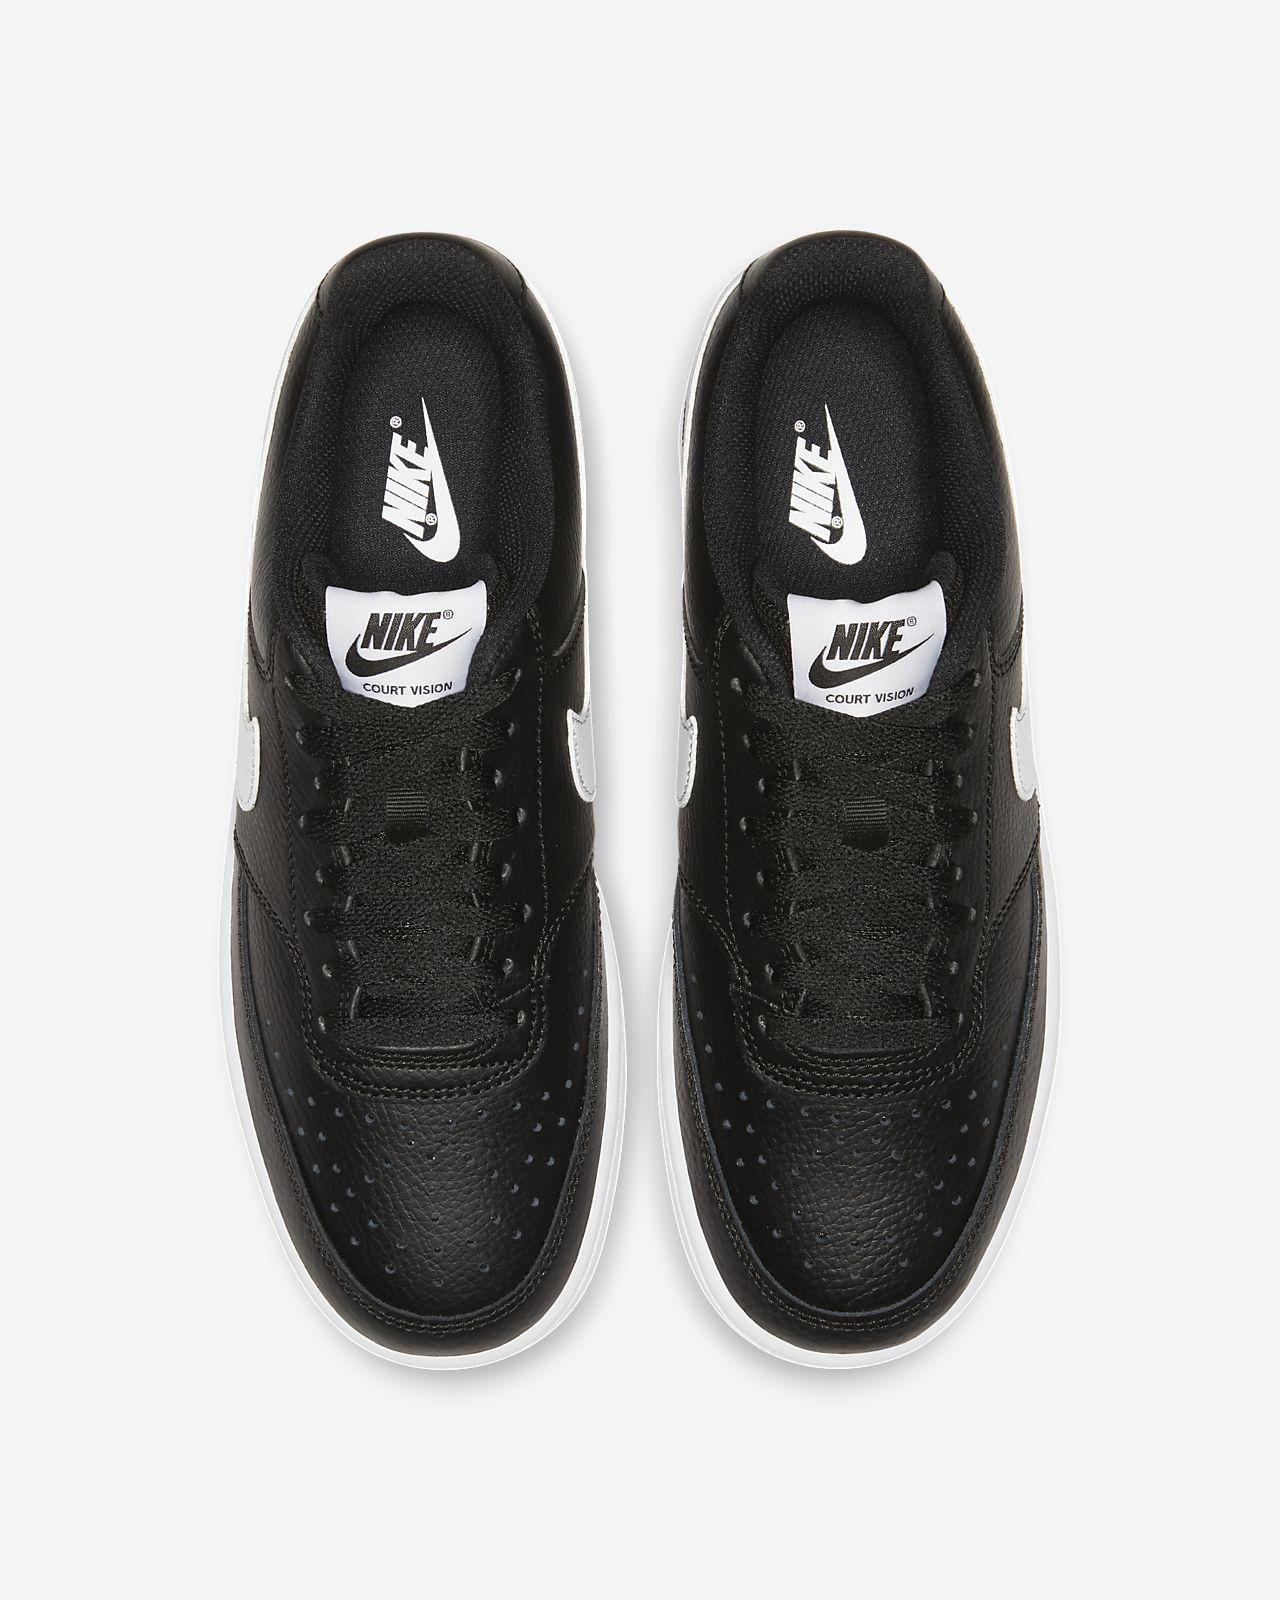 Nike Court Vision Low Women's Shoe